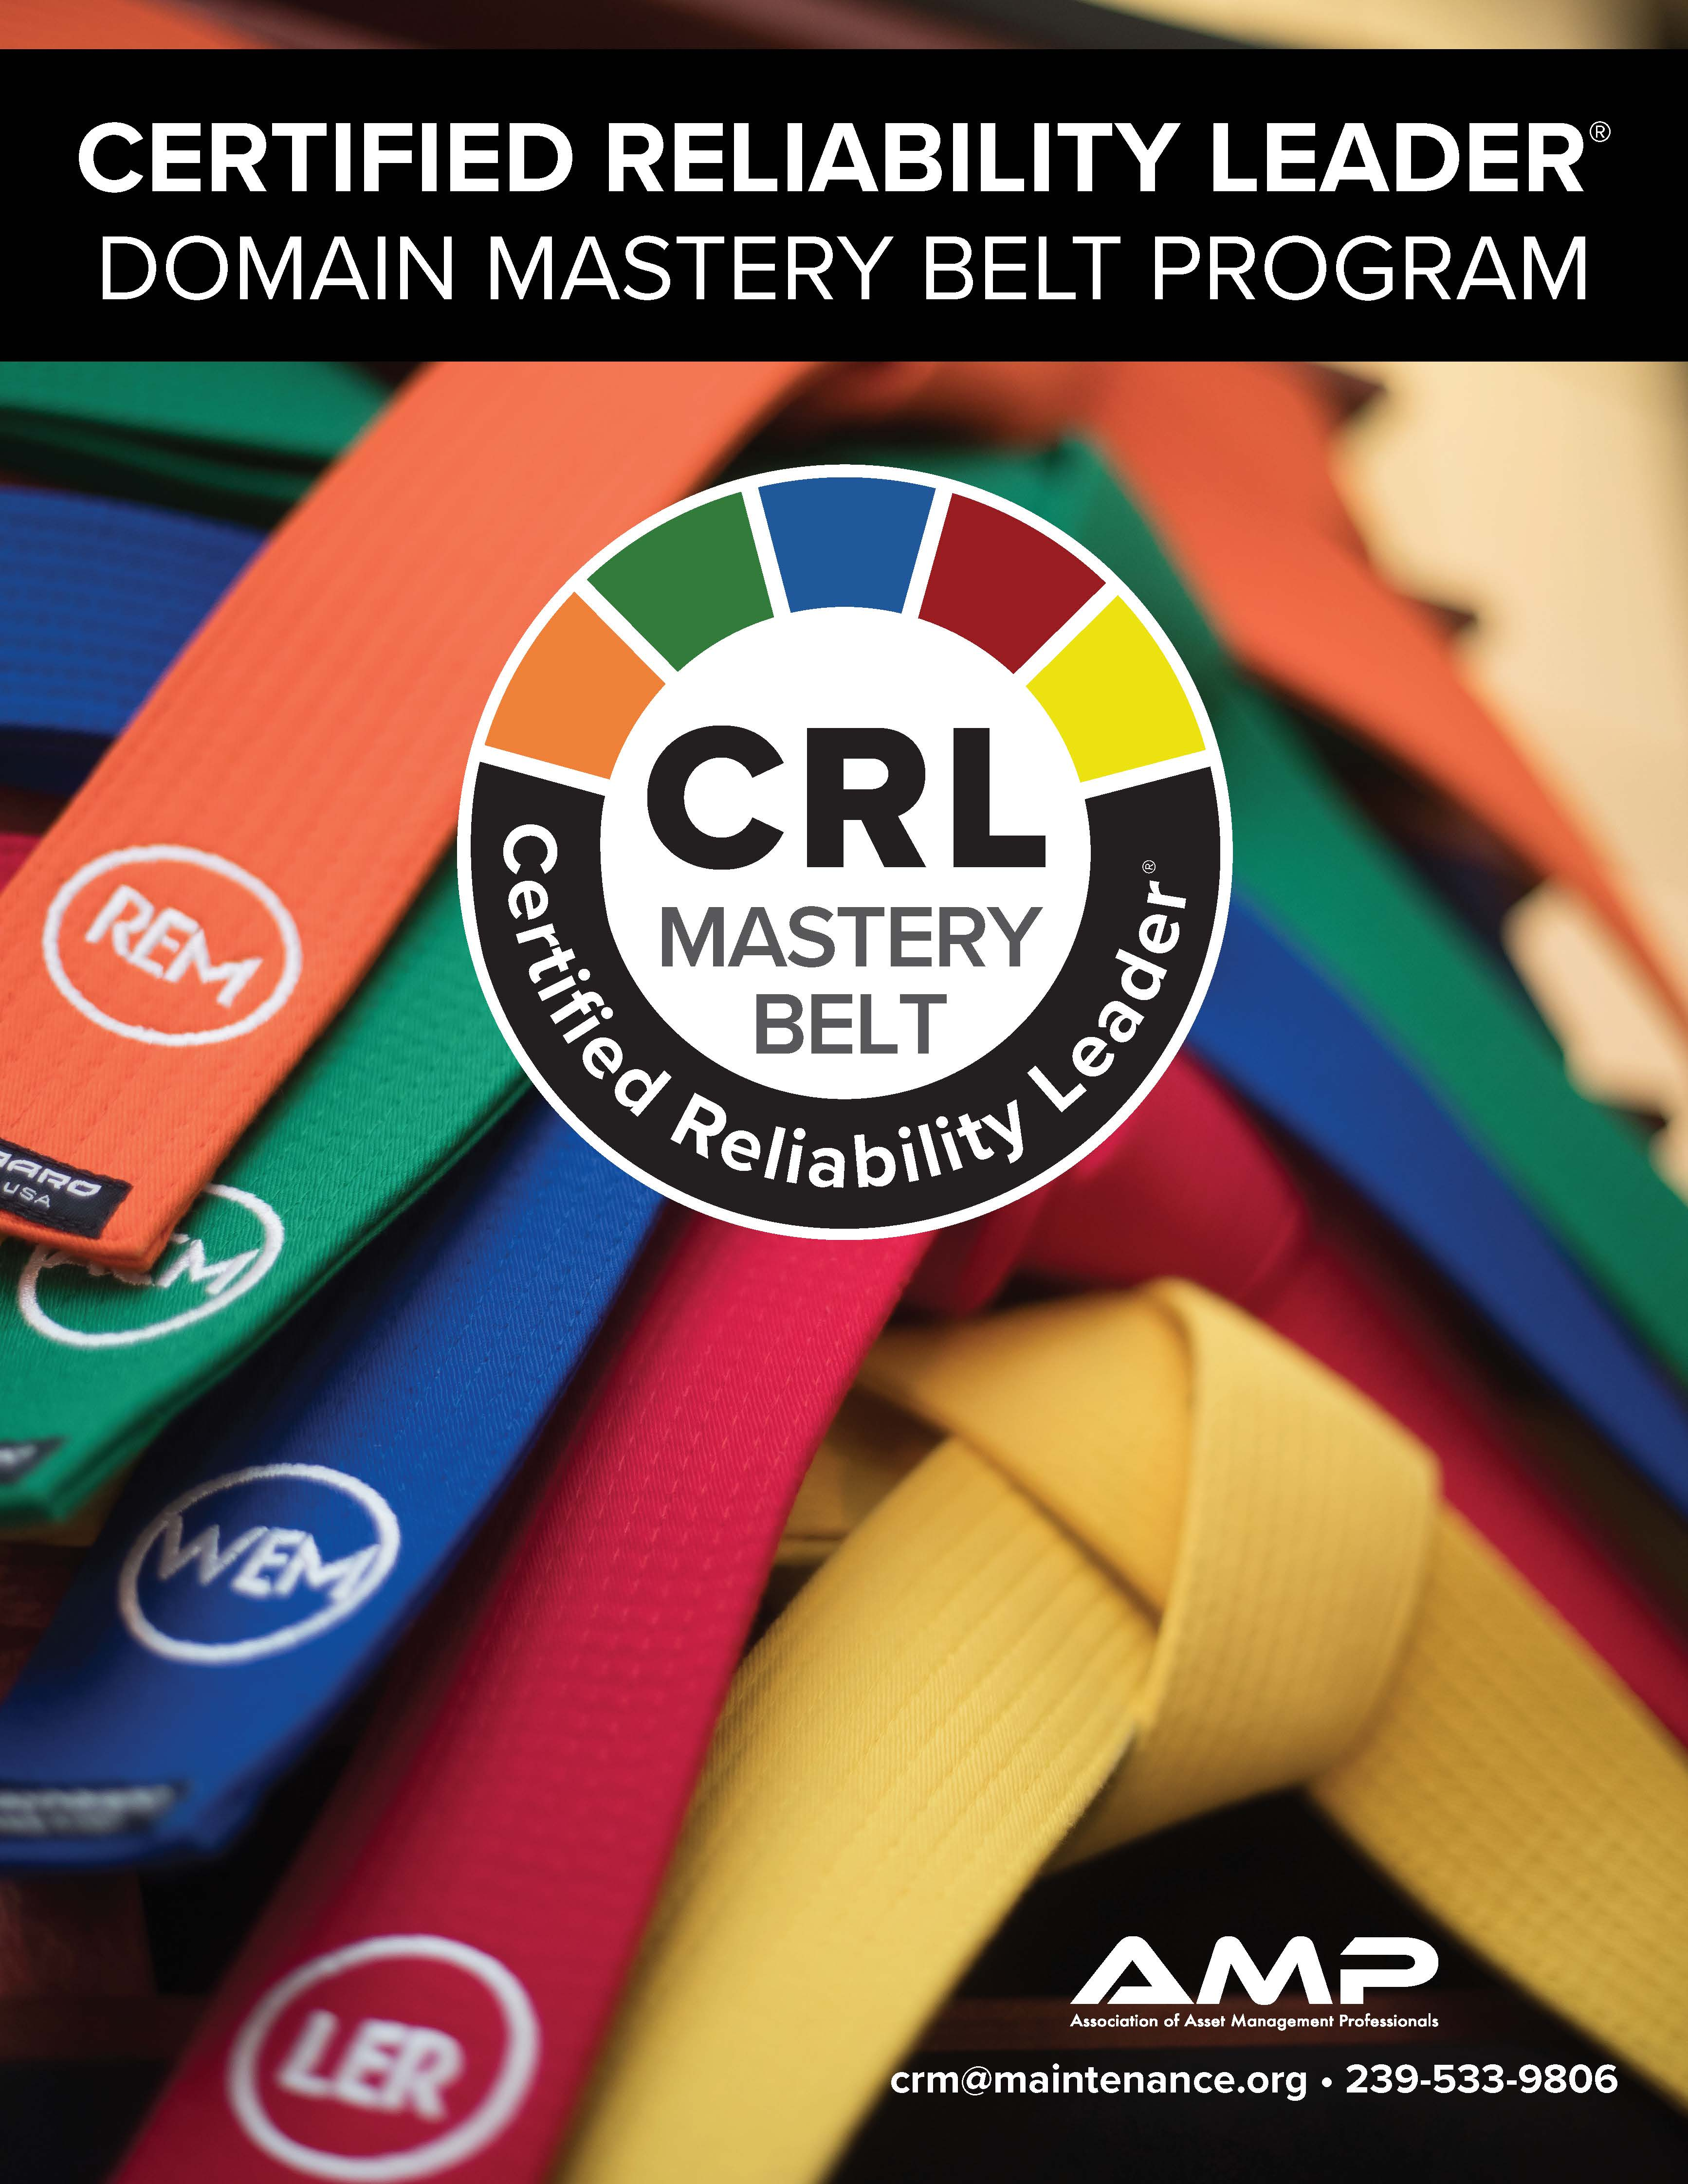 CRL Mastery Belt